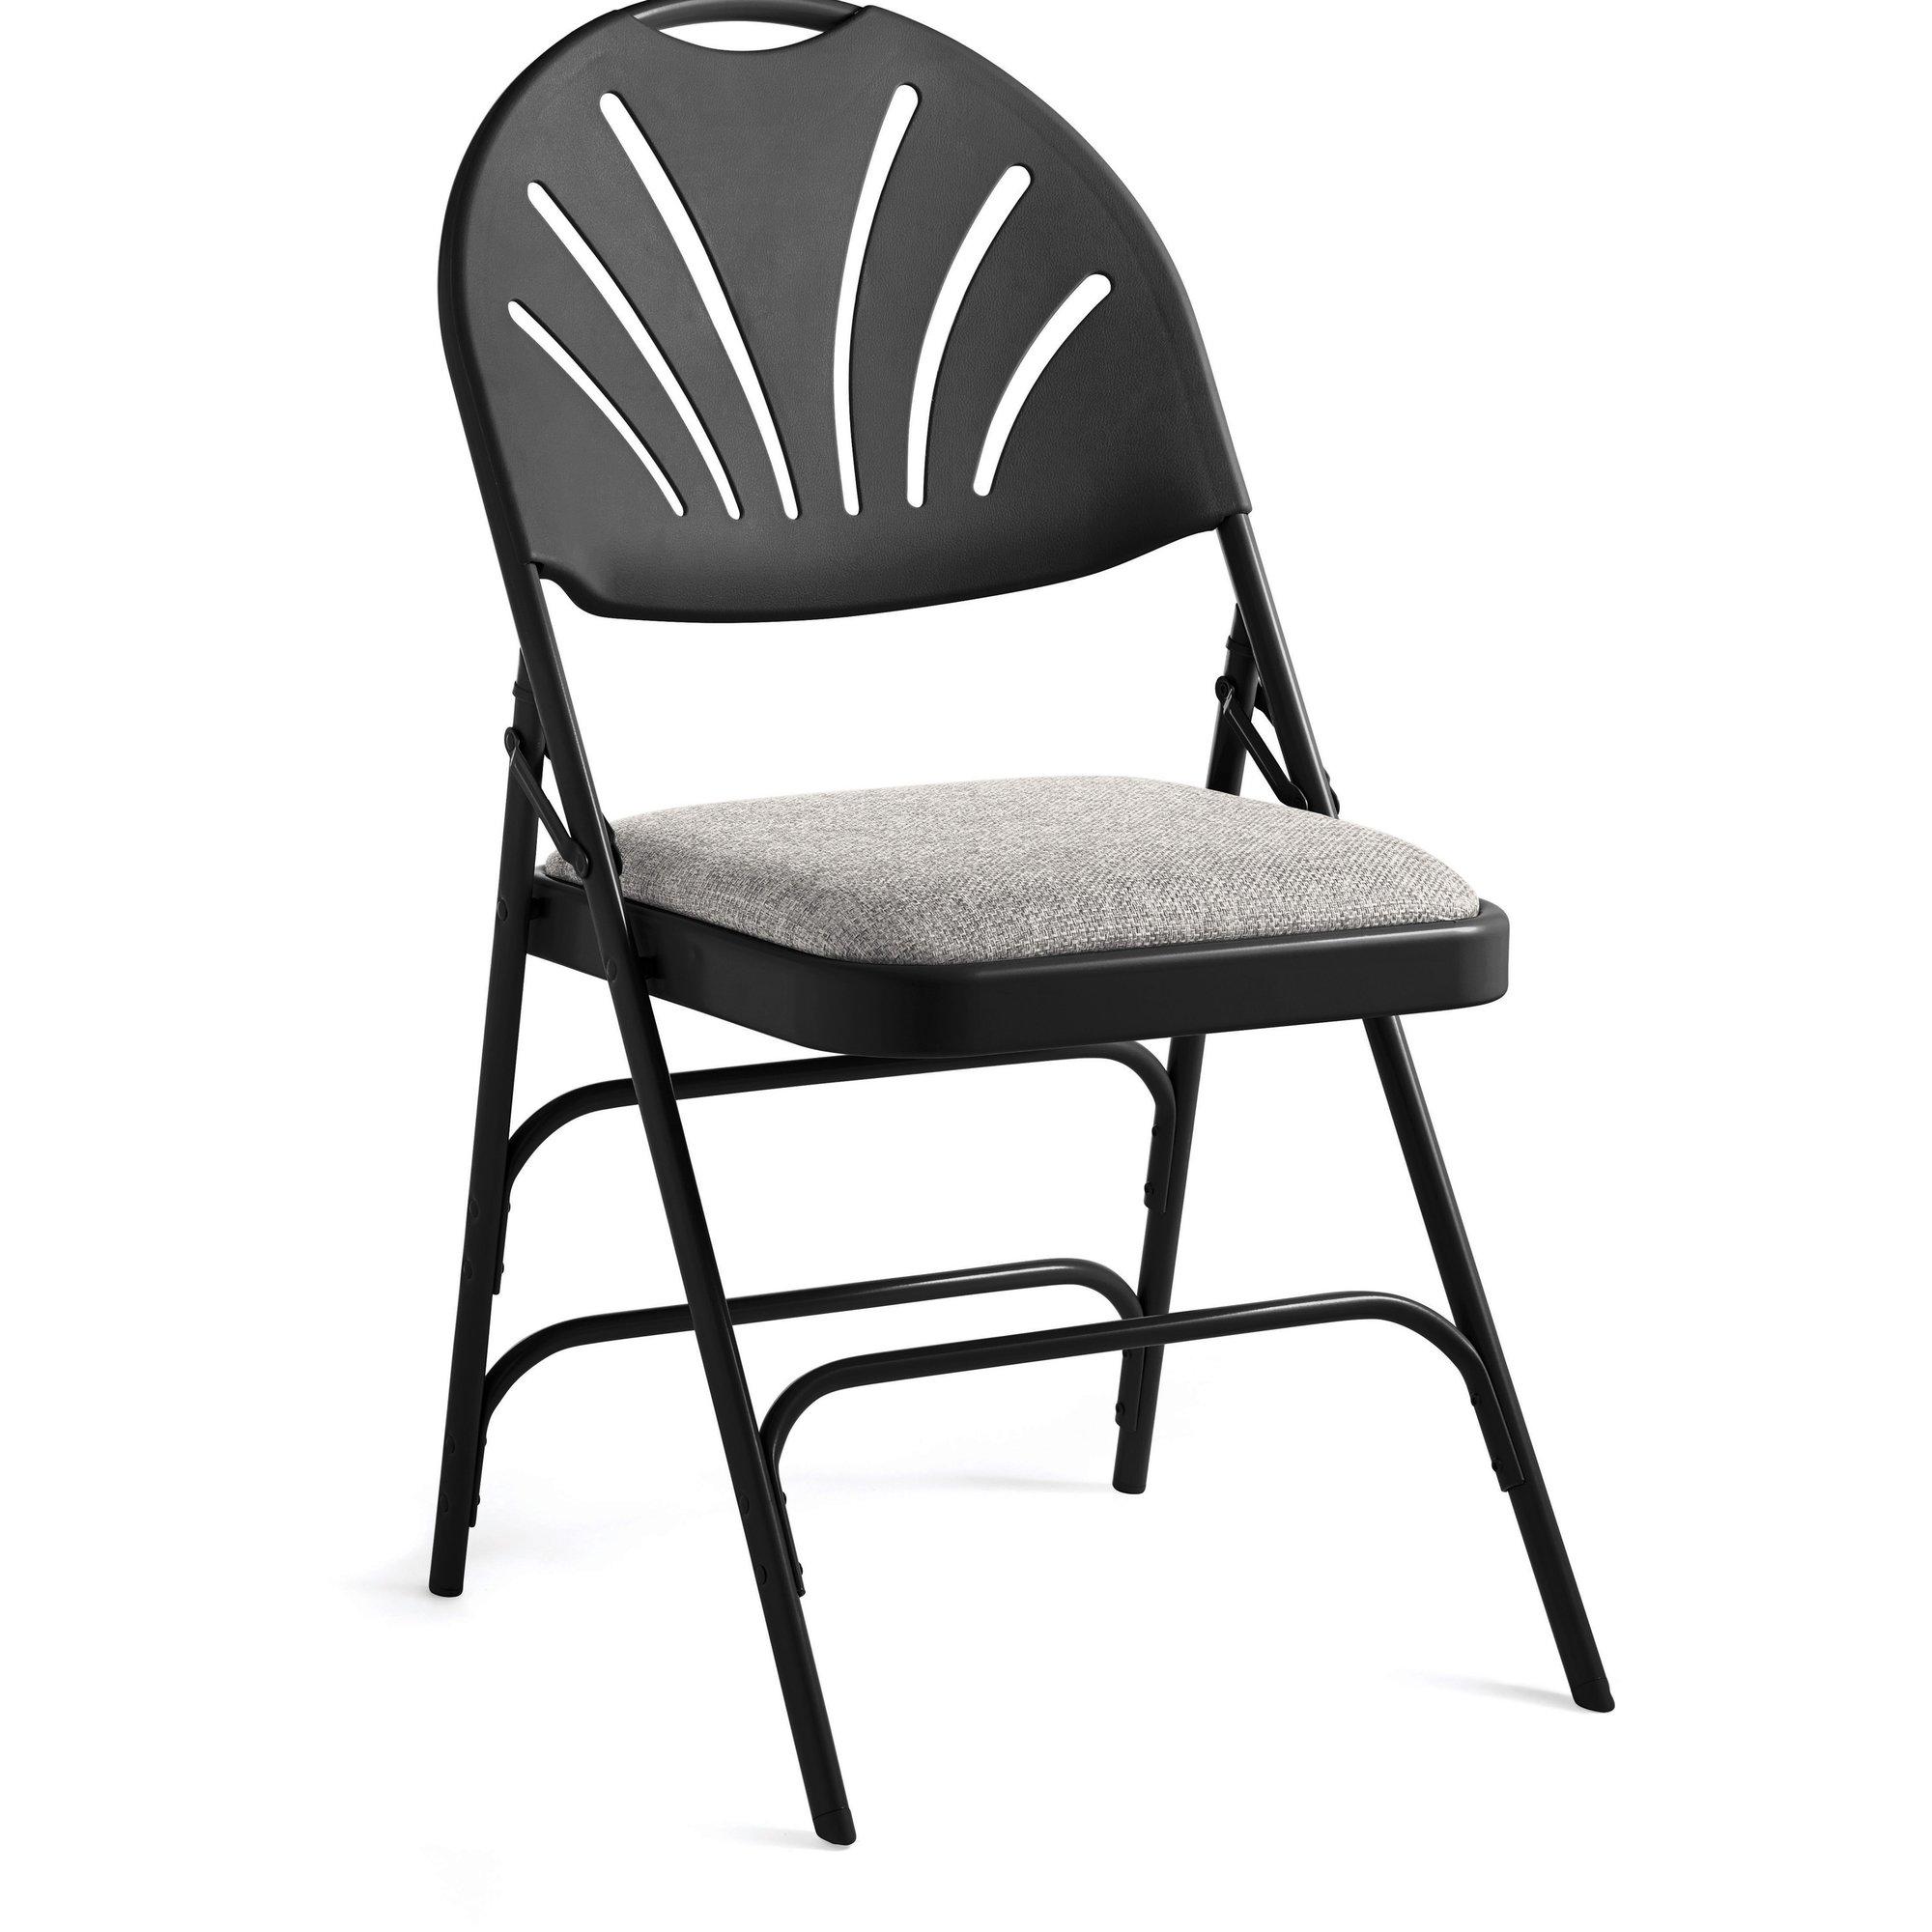 2000x2000 Samsonite Fanback Fabric Padded Folding Chair Set Of 4 Ebay